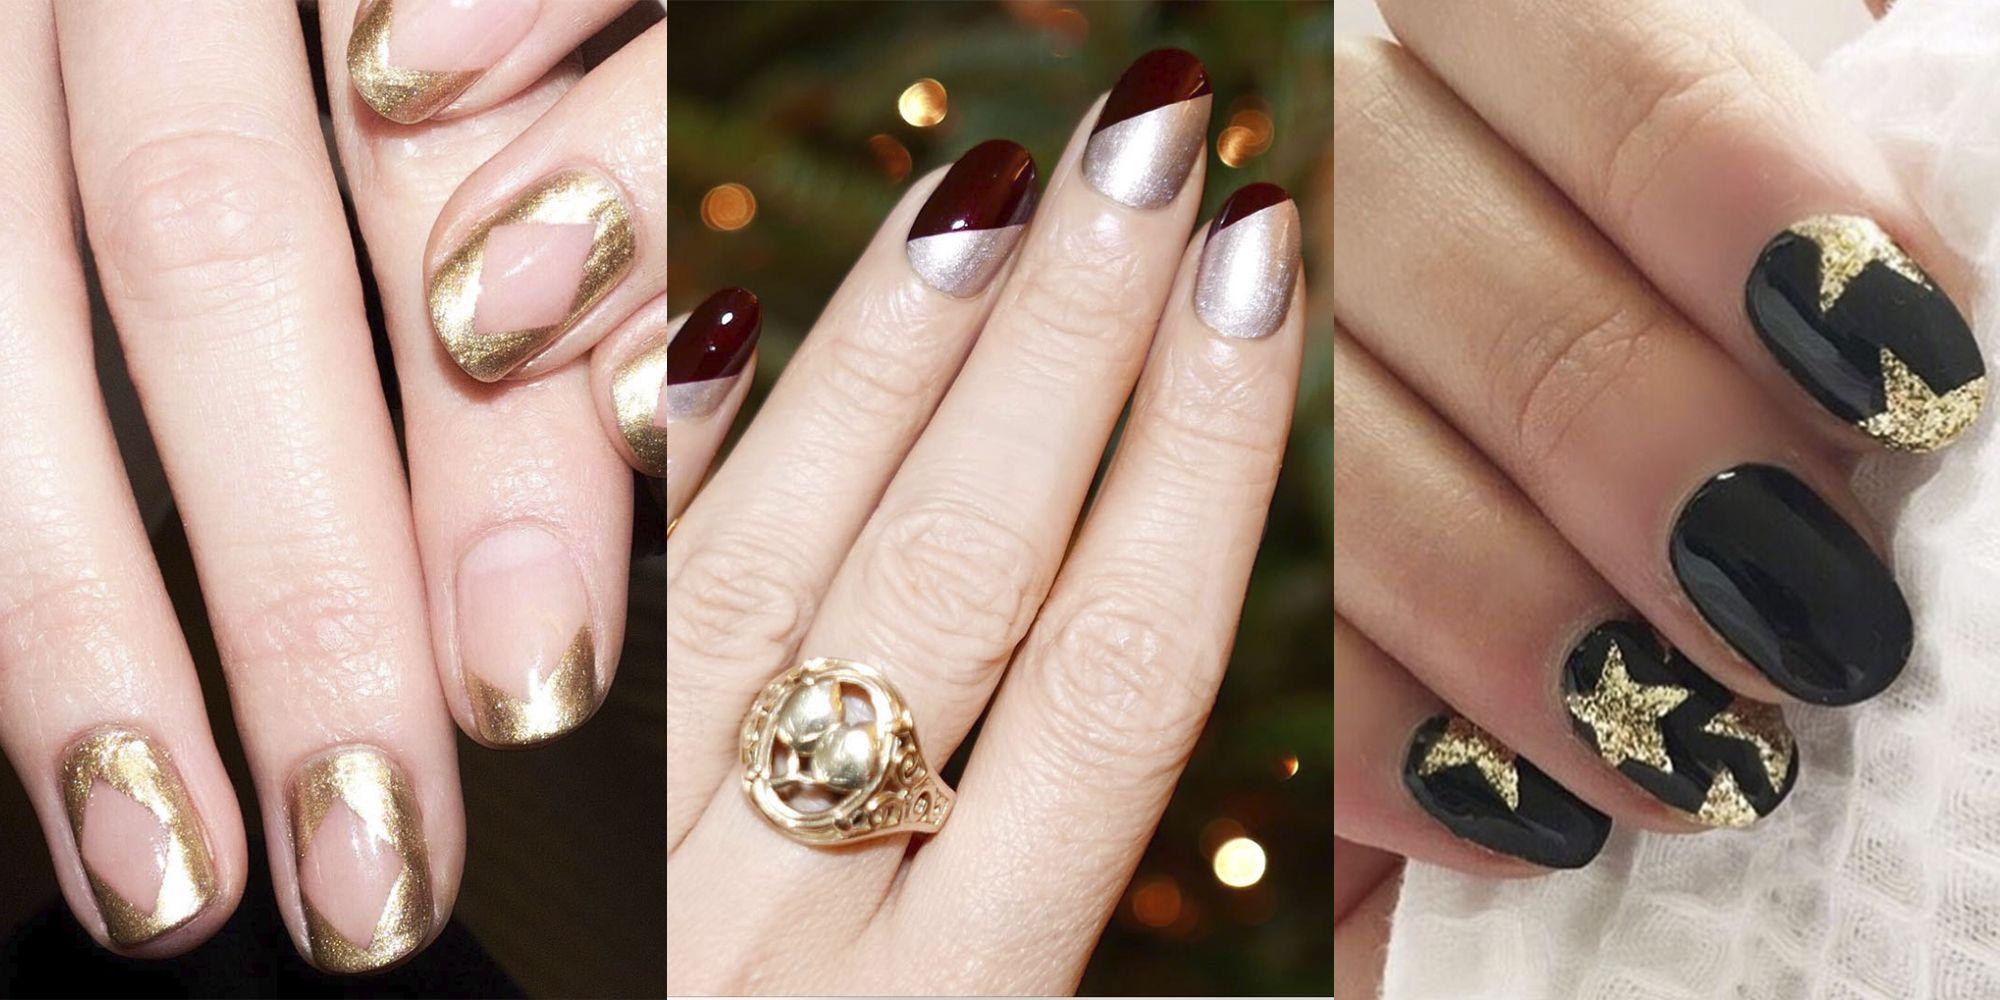 21 Glitter Nail Art Designs , Sparkly Ideas for Chic Glitter